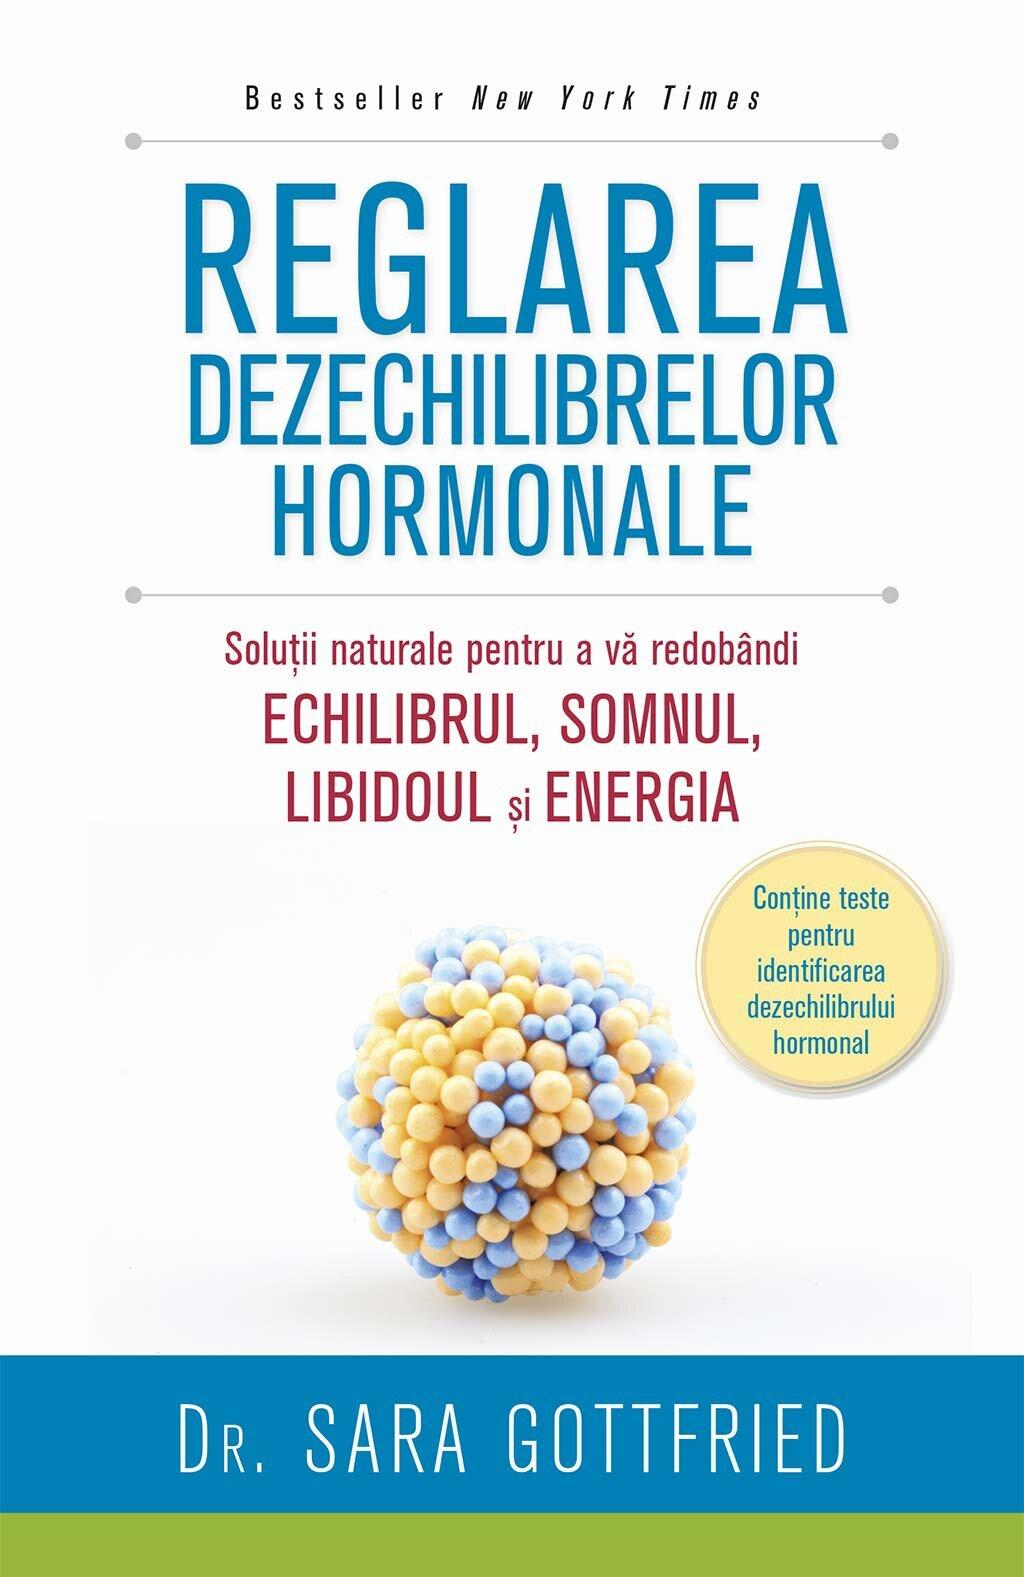 Reglarea dezechilibrelor hormonale. Solutii naturale pentru a va redobandi echilibrul, somnul, libidoul si energia PDF (Download eBook)